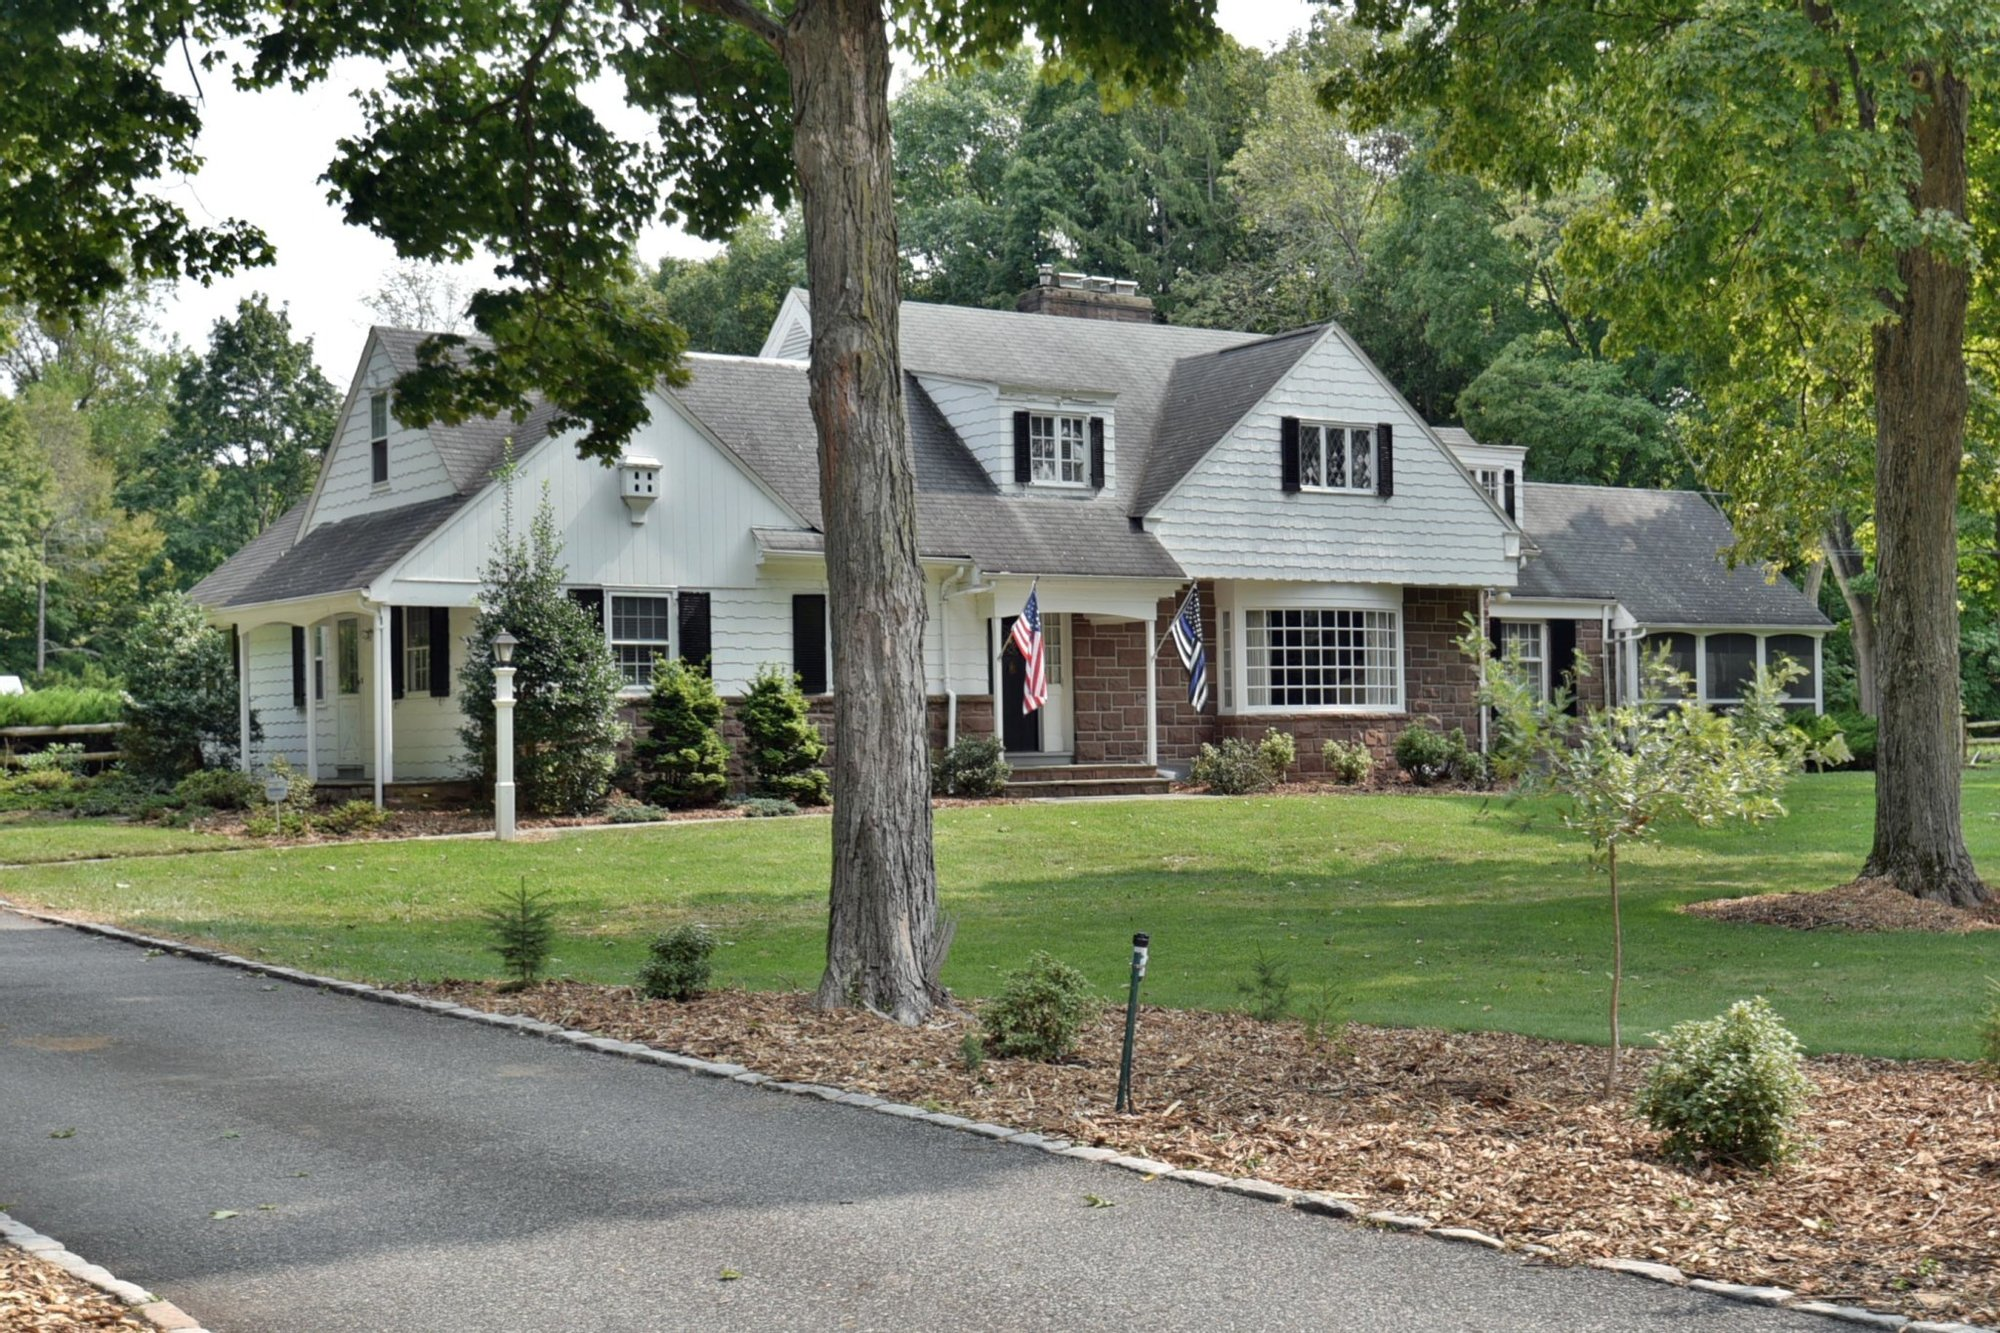 Casa a Saddle River, New Jersey, Stati Uniti 1 - 11323658